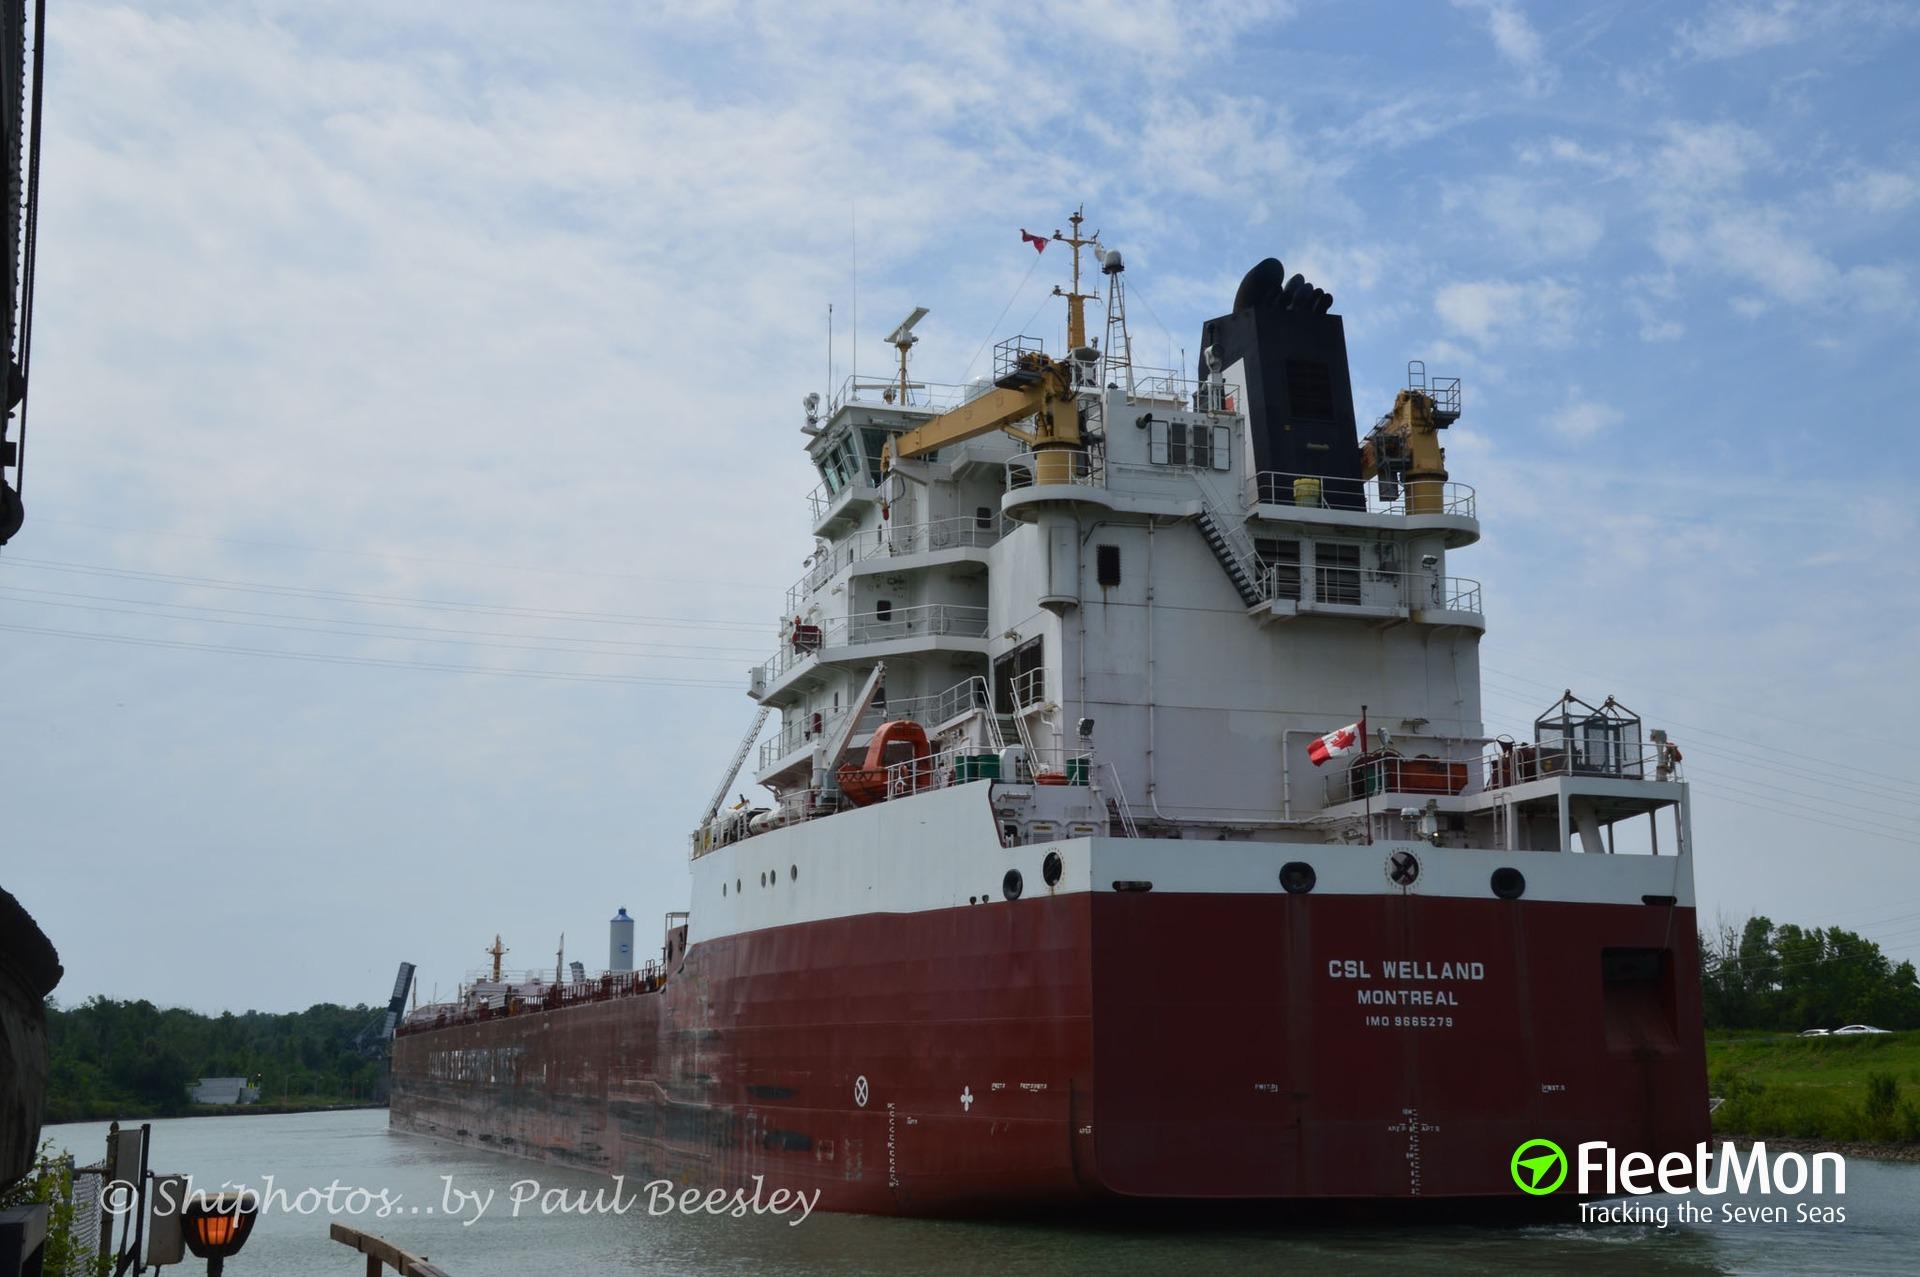 Photo of CSL WELLAND (IMO: 9665279. MMSI: 316026695. Callsign: CFK5151) taken by Shiphotos